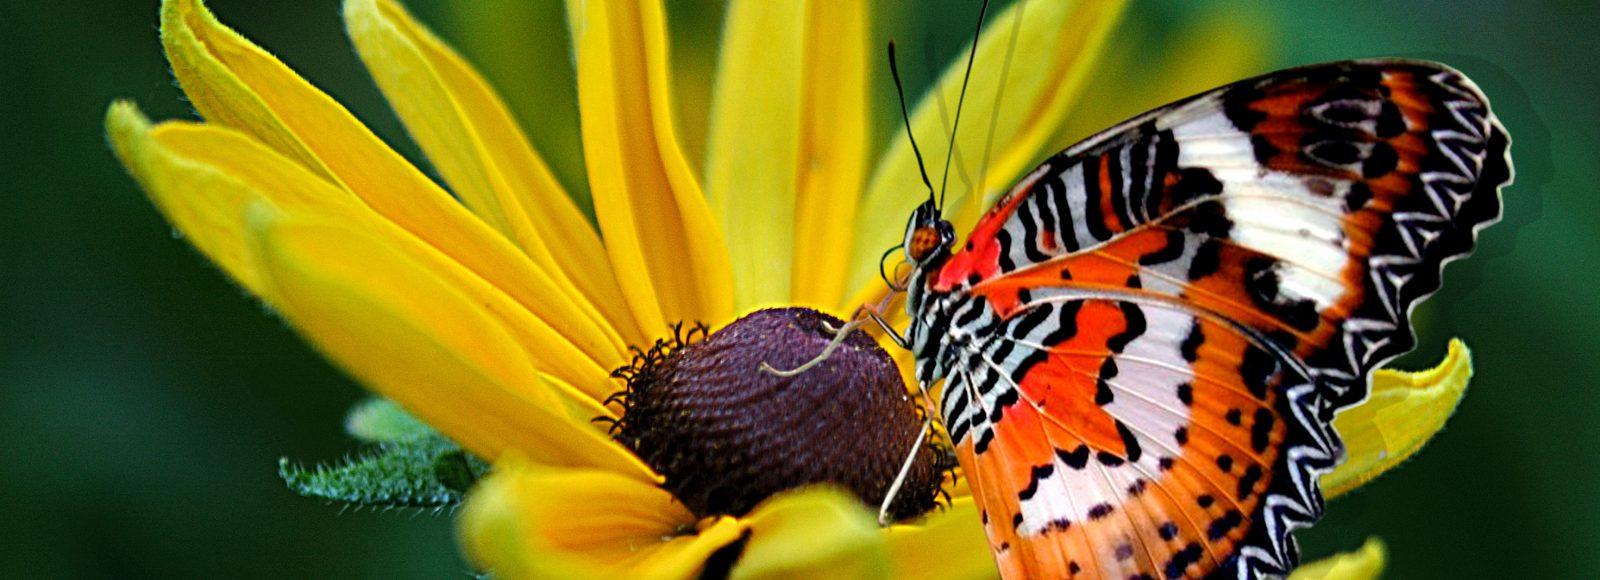 Botanical Gardens near Danville CA